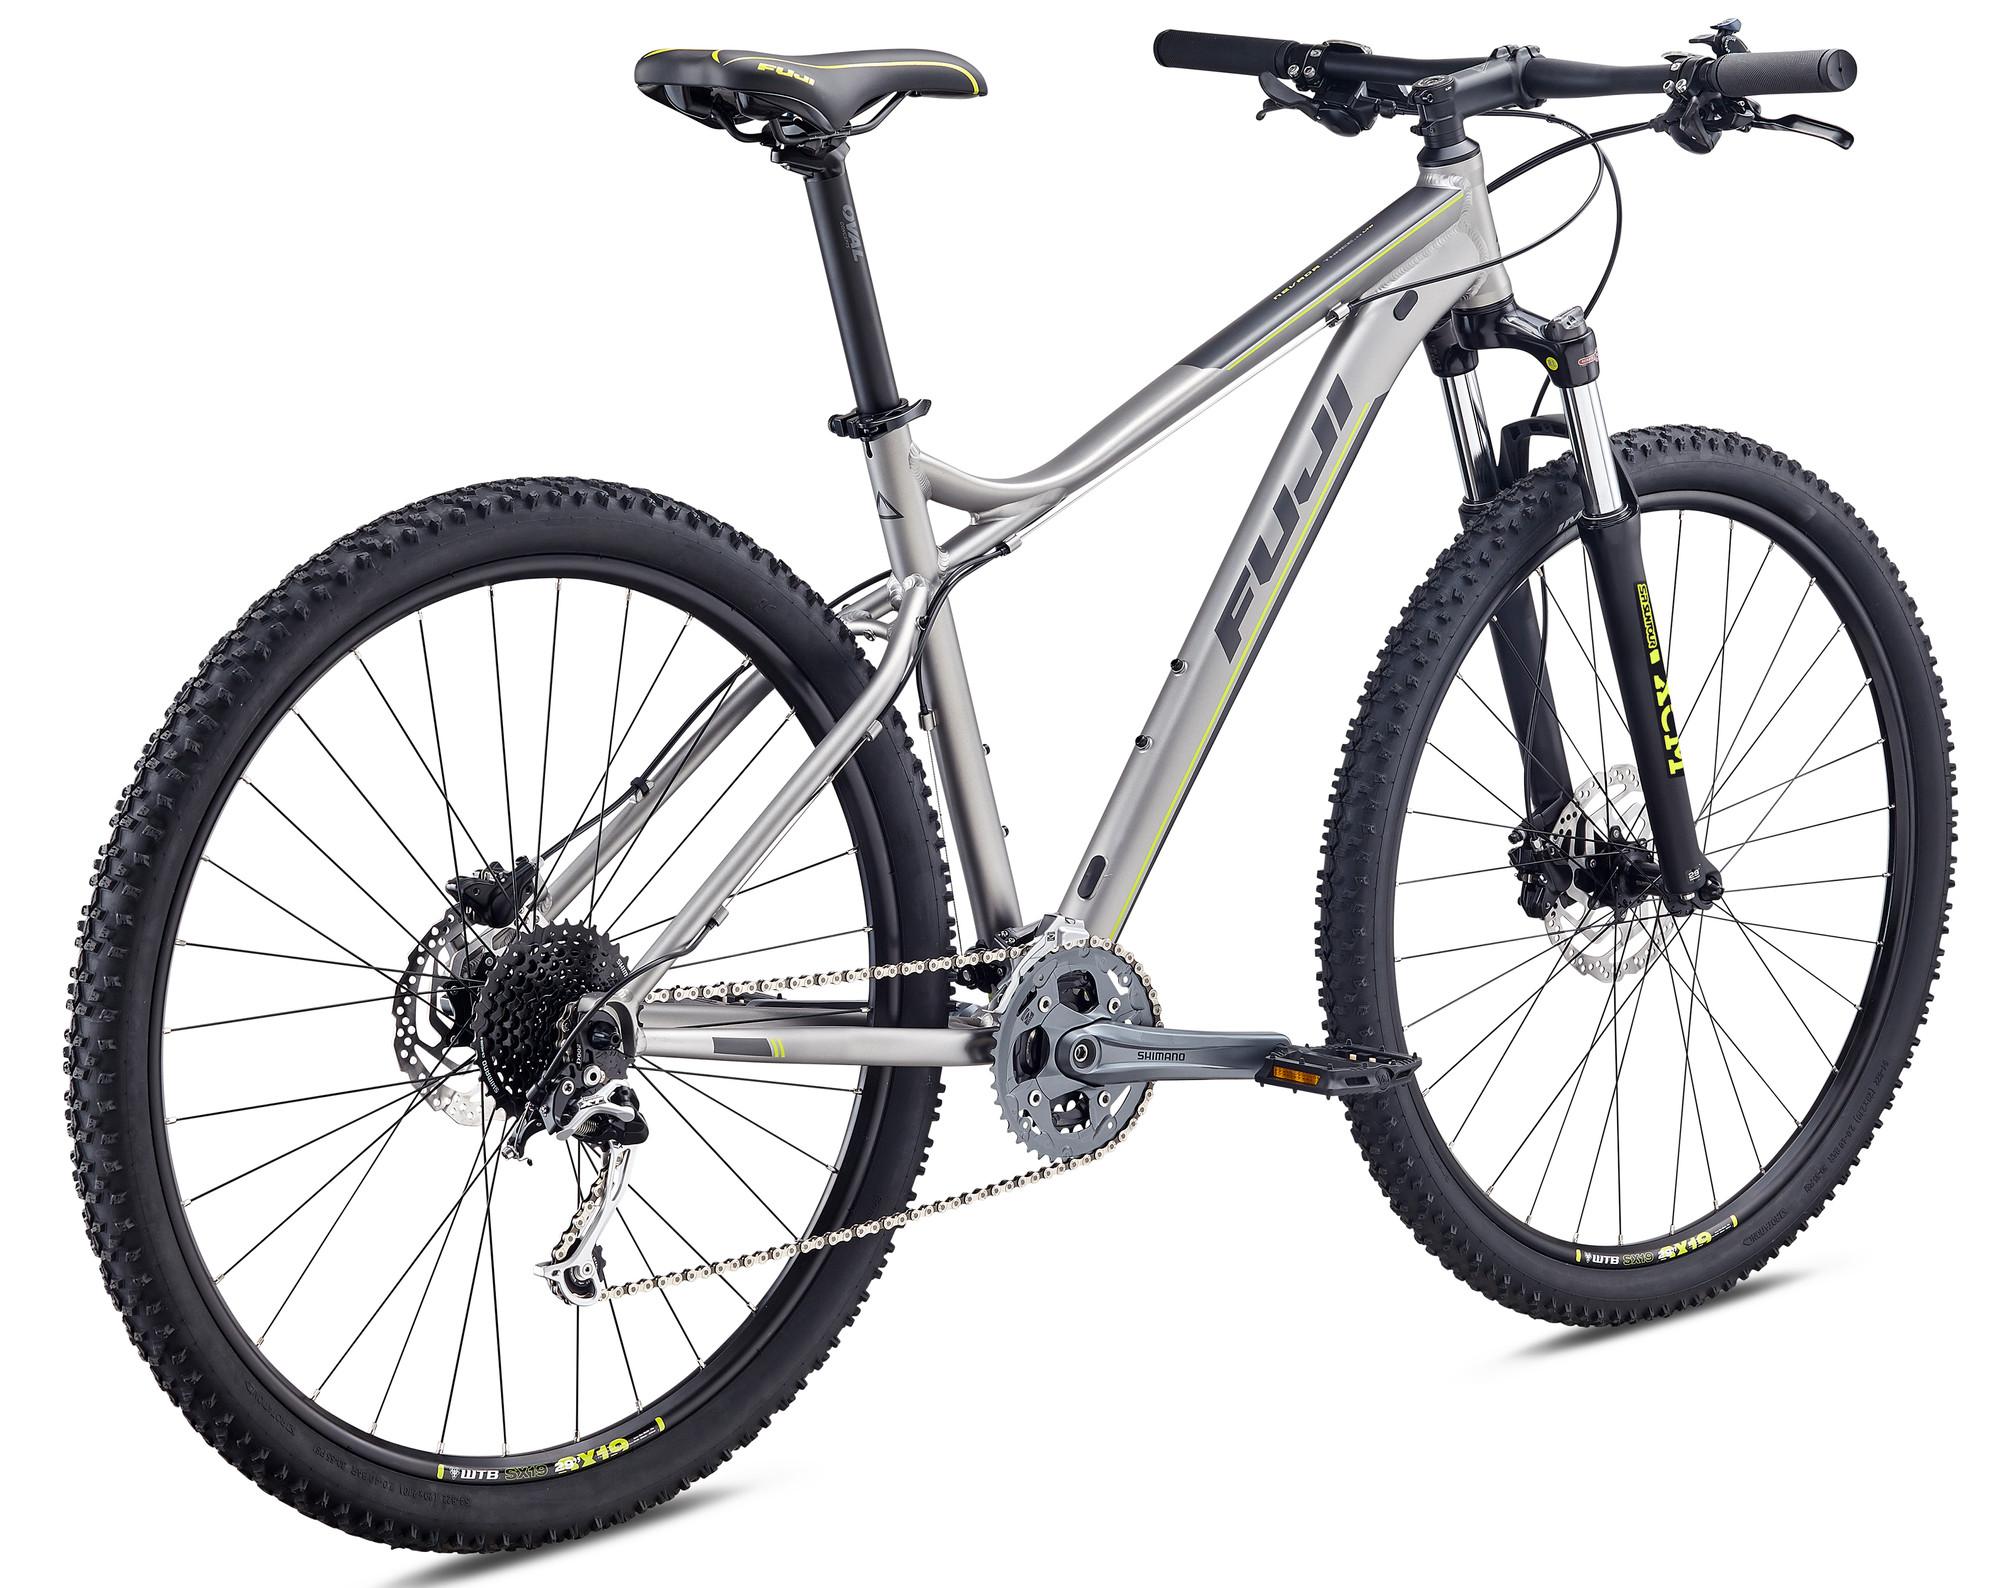 fuji nevada 29 3 0 ltd 29 zoll mountainbike hardtail mtb fahrrad mountain bike fahrrad sale. Black Bedroom Furniture Sets. Home Design Ideas